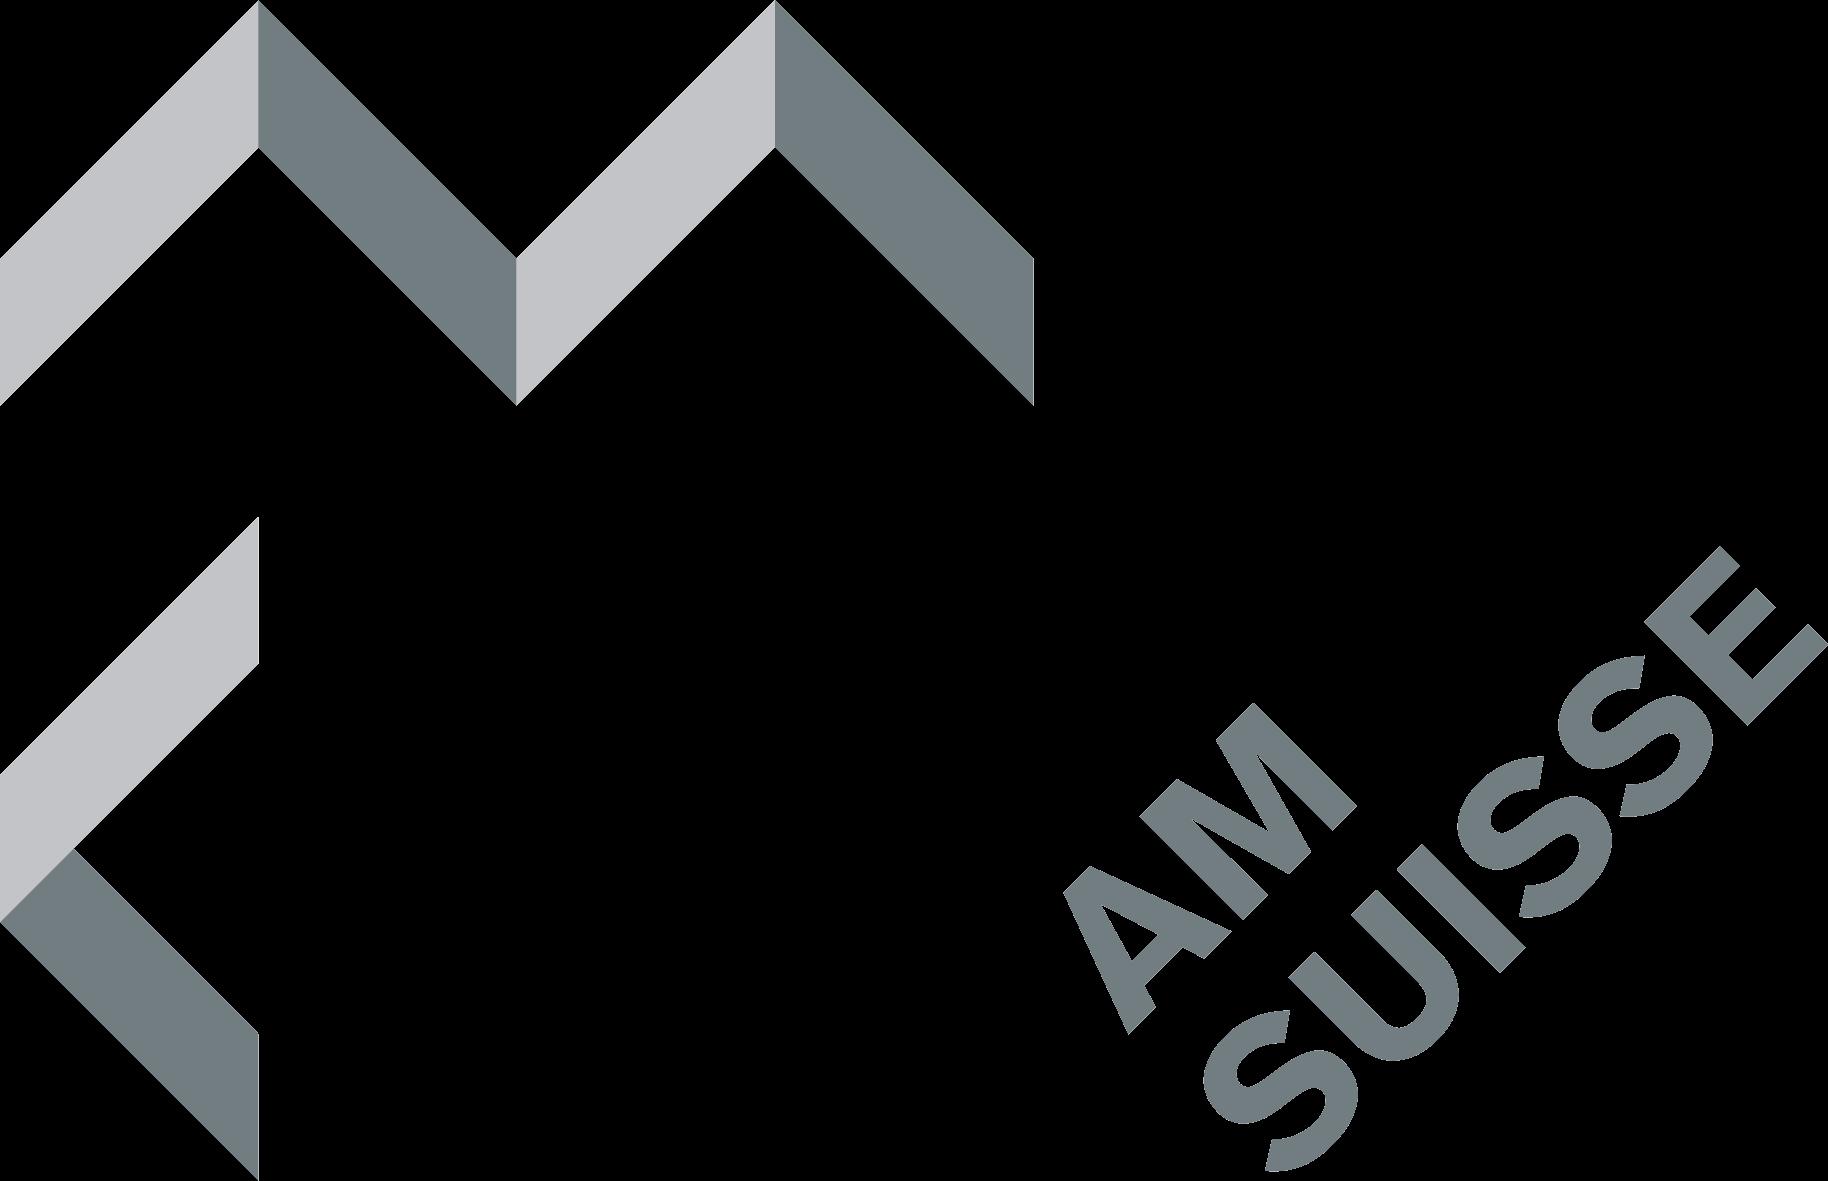 AM Suisse Arbeitgeberverband